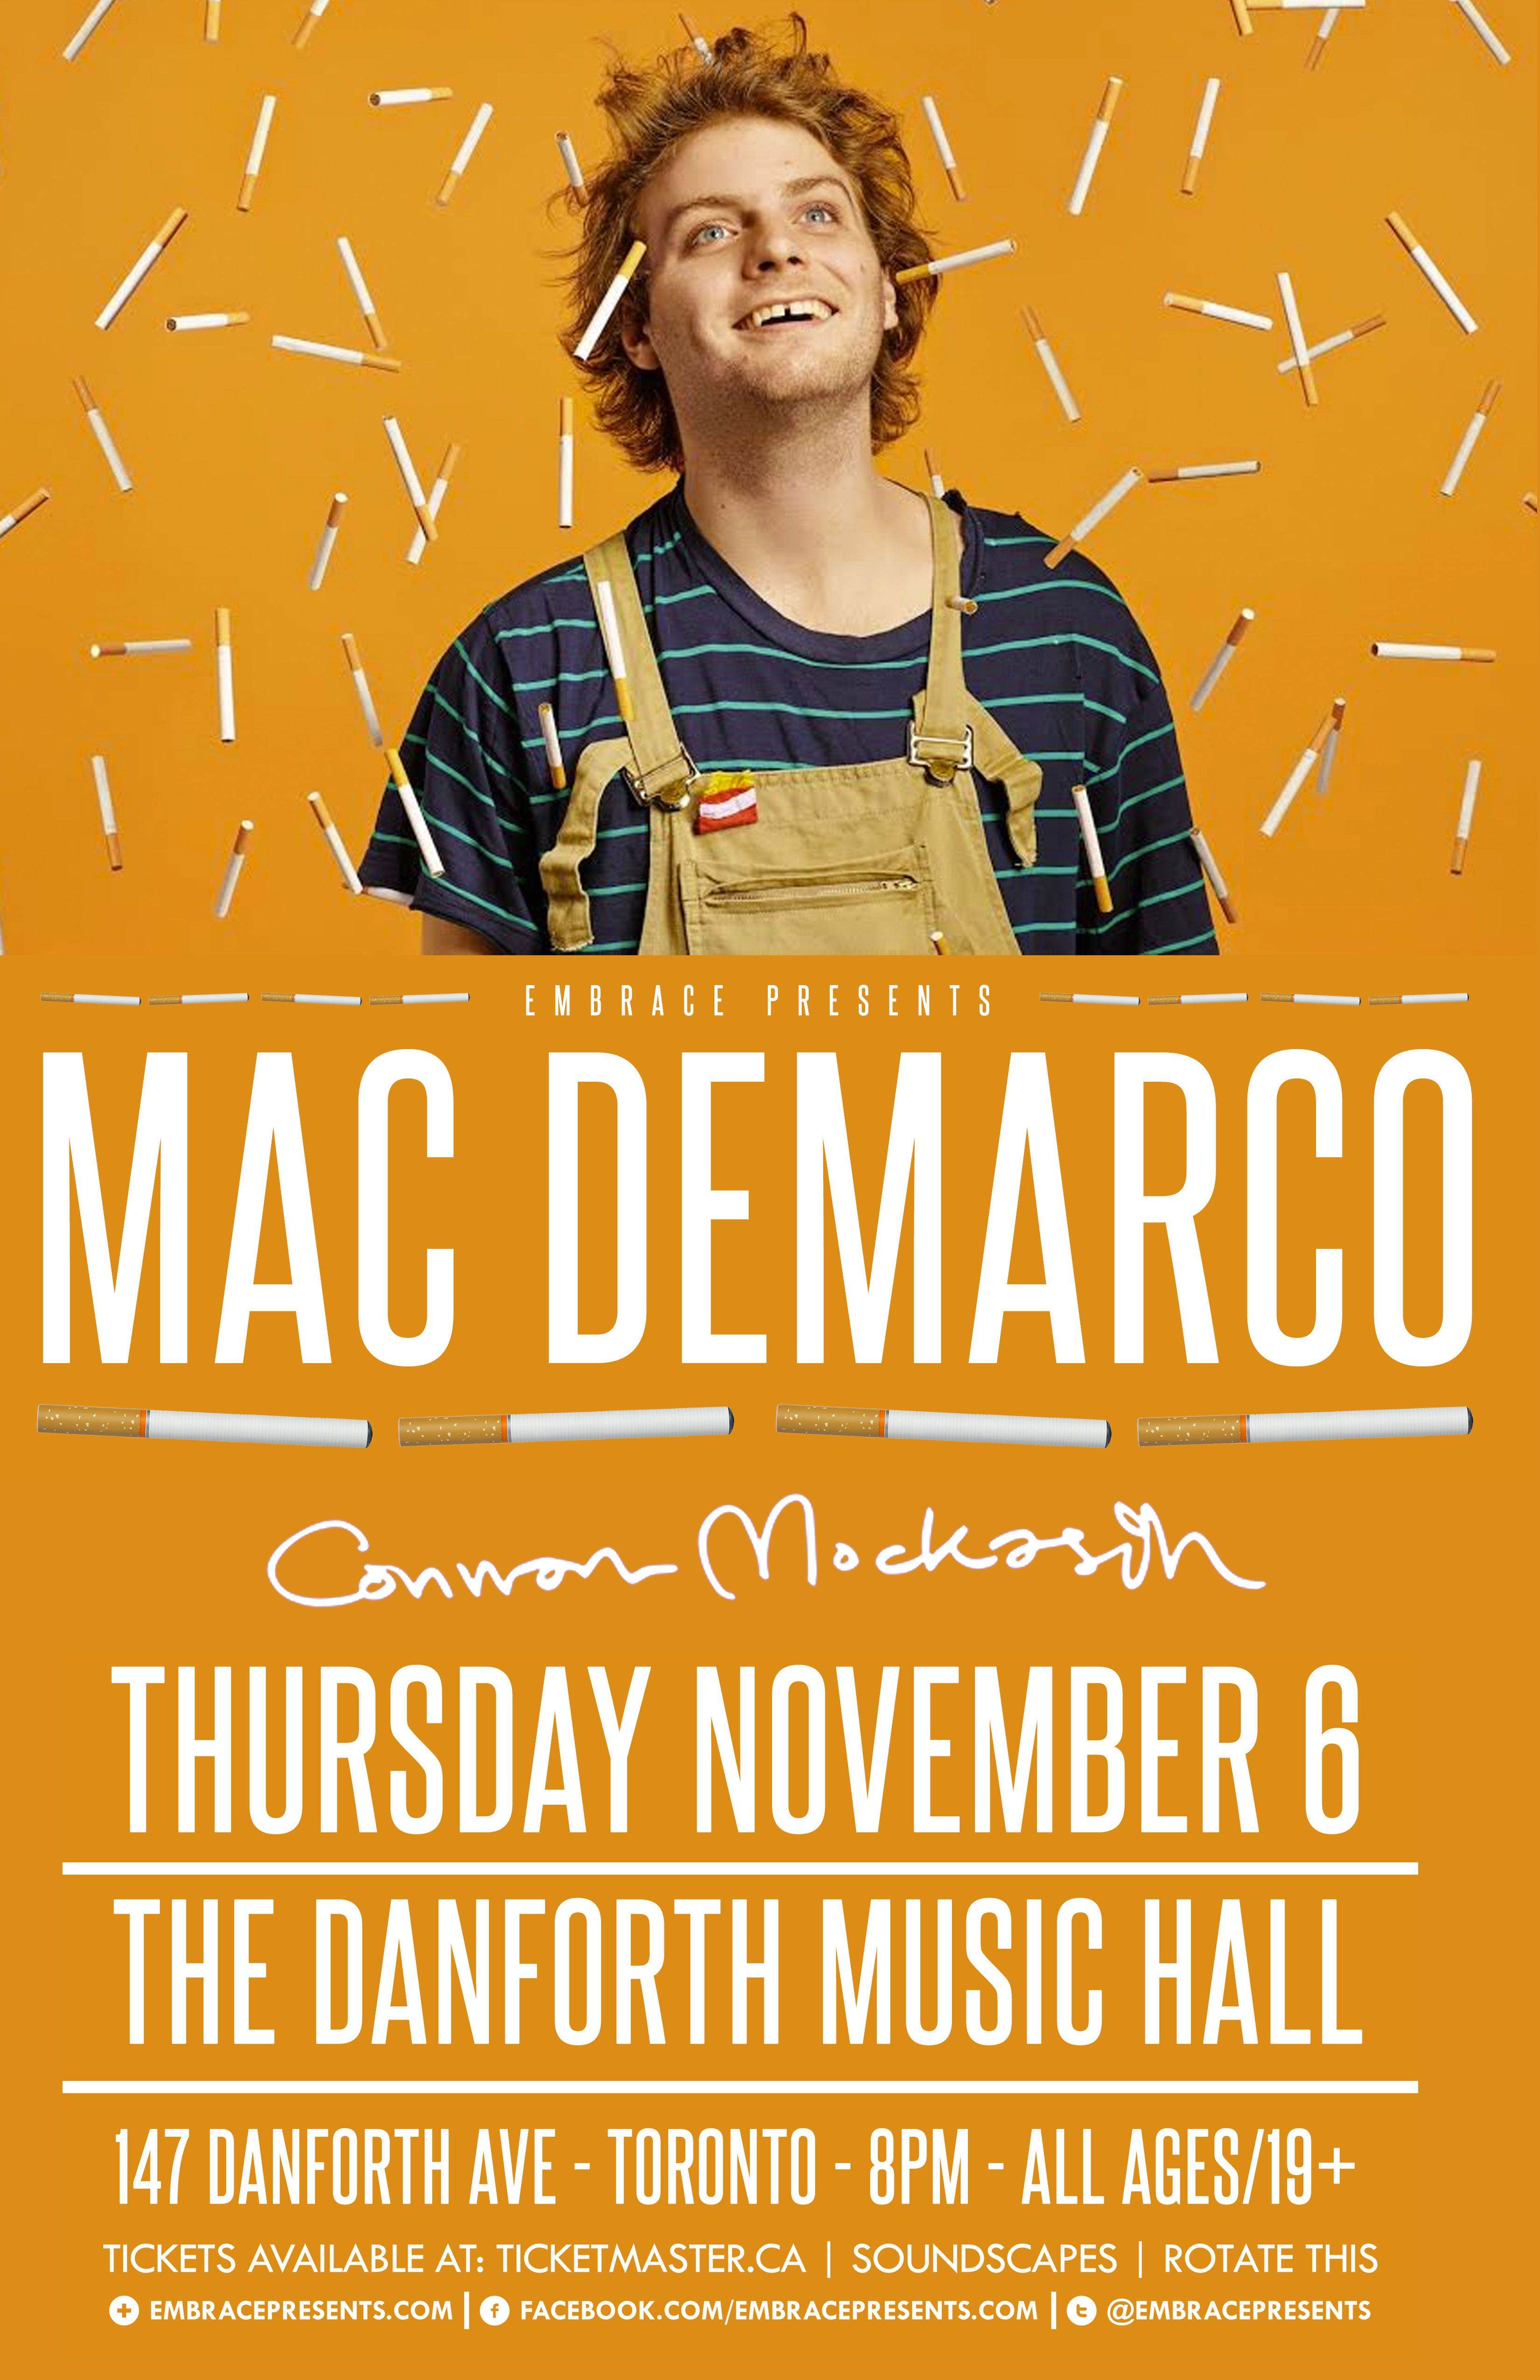 Poster design on mac - Mac Demarco Poster